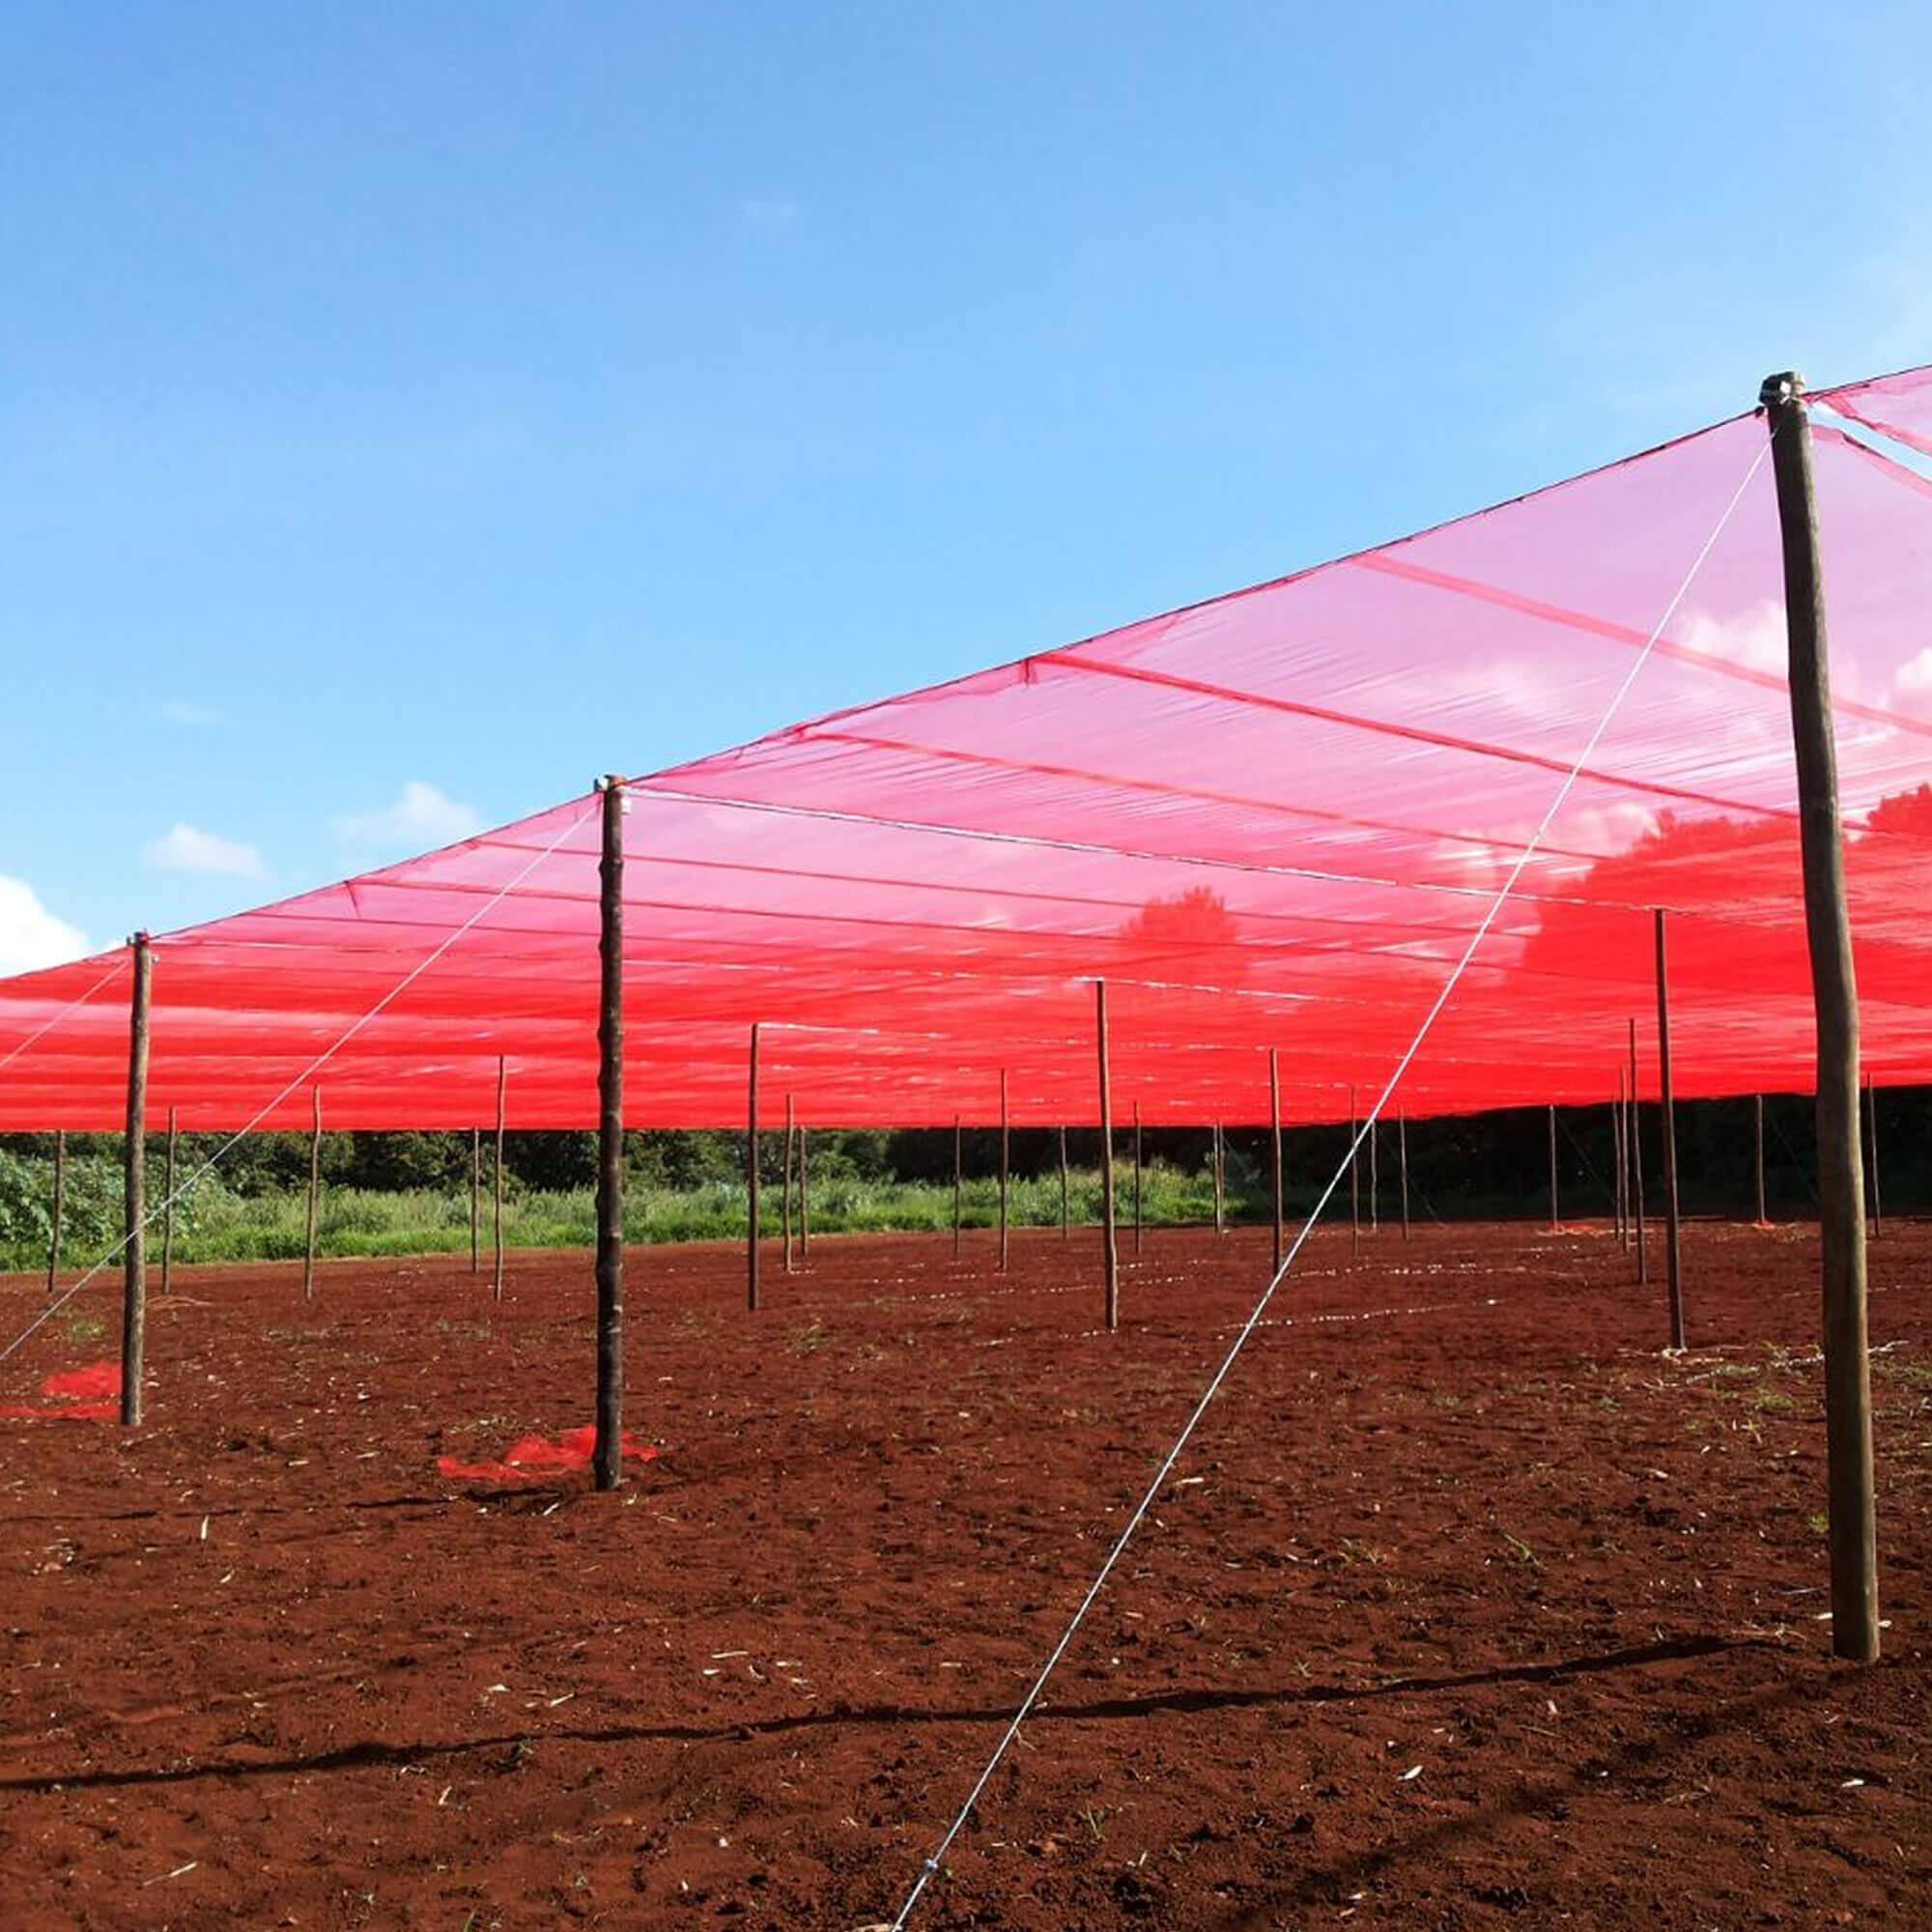 Tela de Sombreamento Vermelha 20% - 4,15 x 20 metros